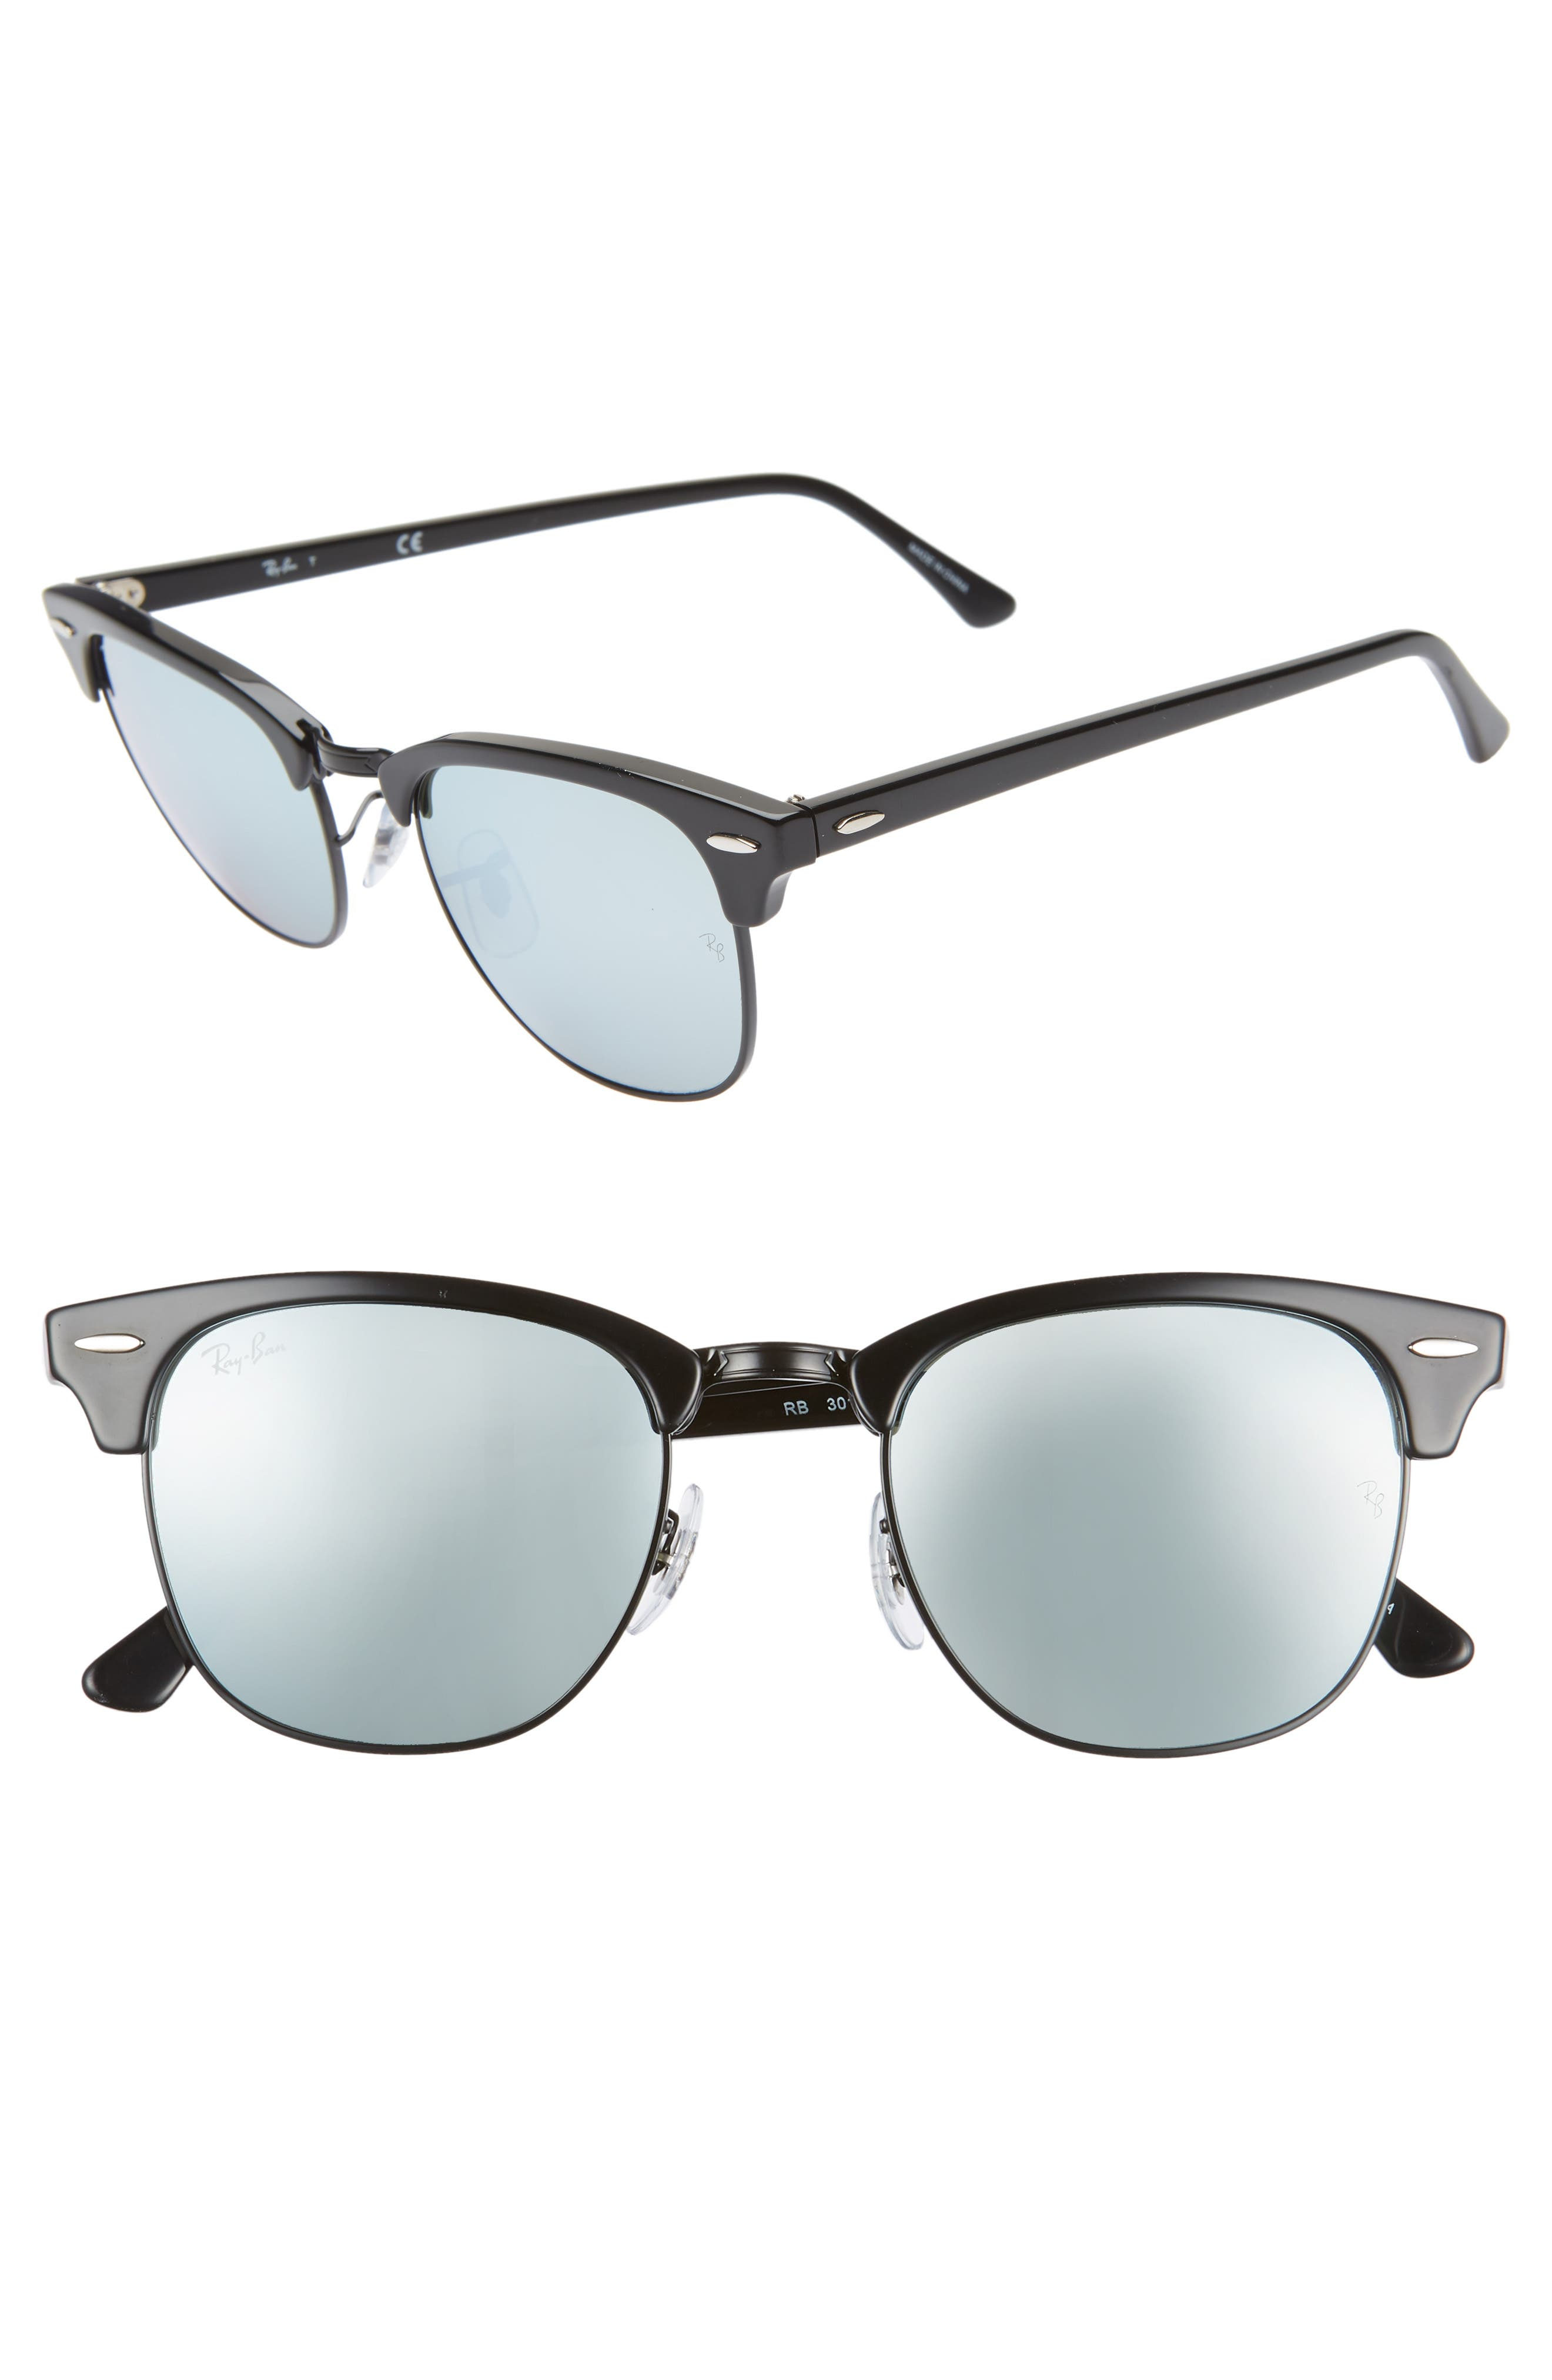 Ray-Ban Standard Clubmaster 51Mm Sunglasses - Black/ Blue Mirror